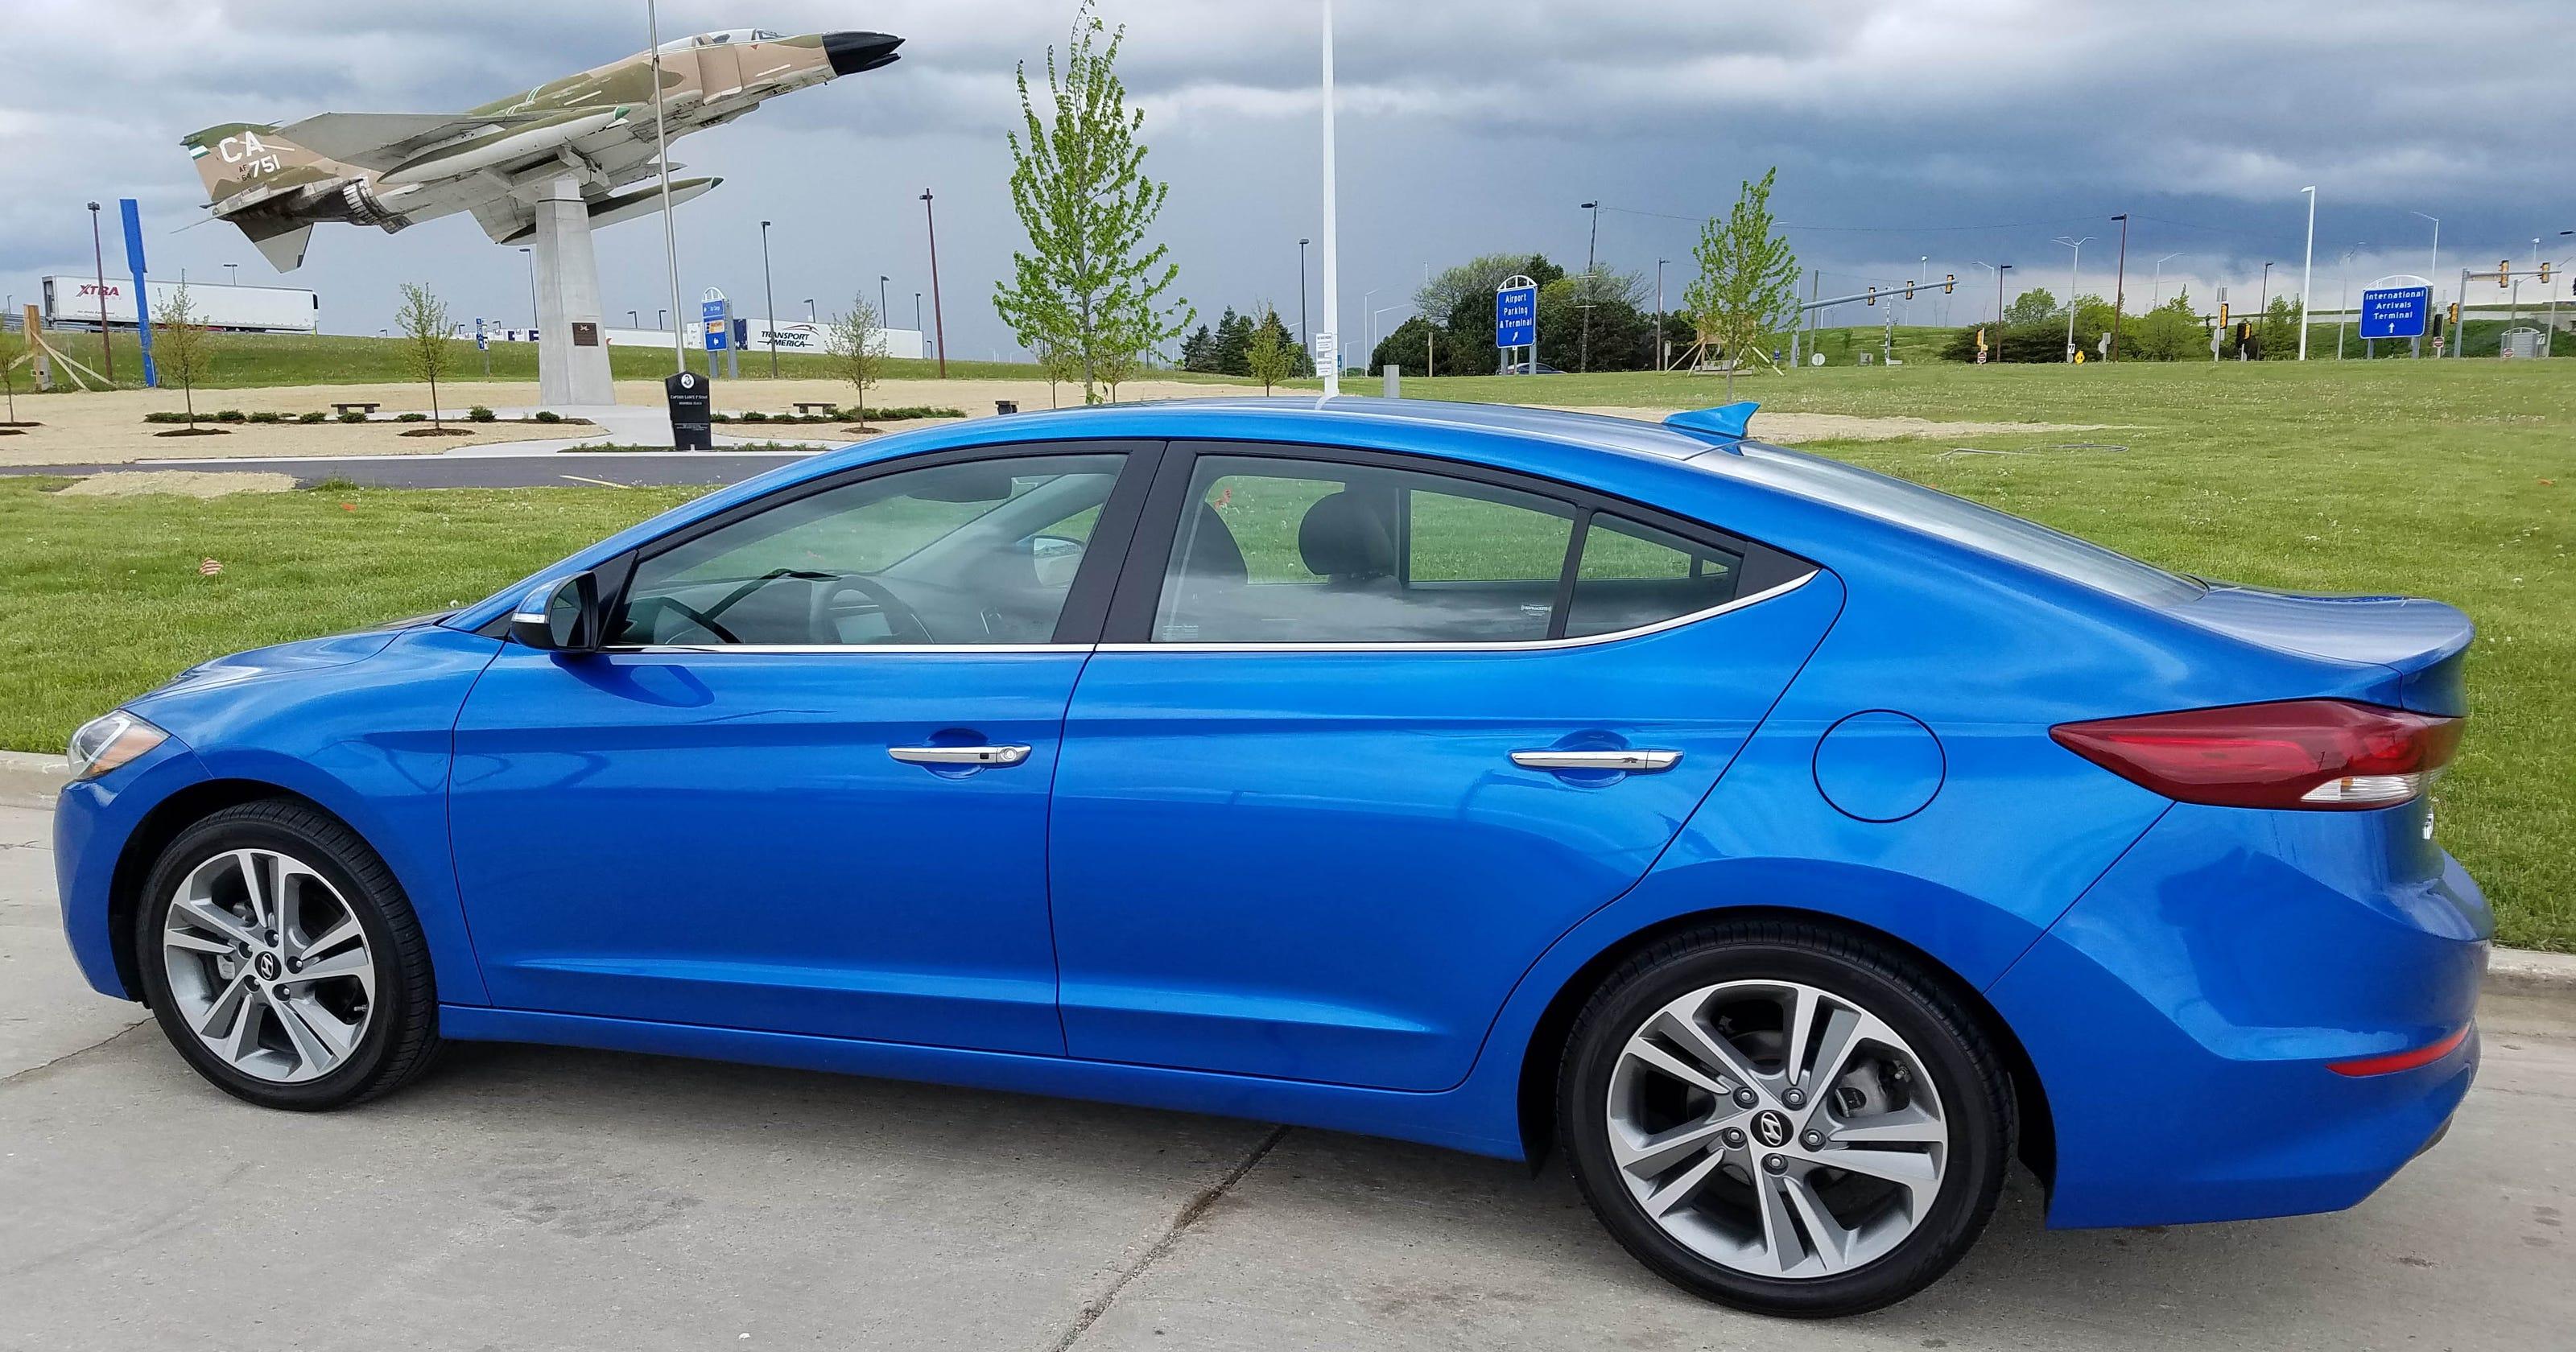 Savage on Wheels: 2017 Hyundai Elantra Limited milder, but